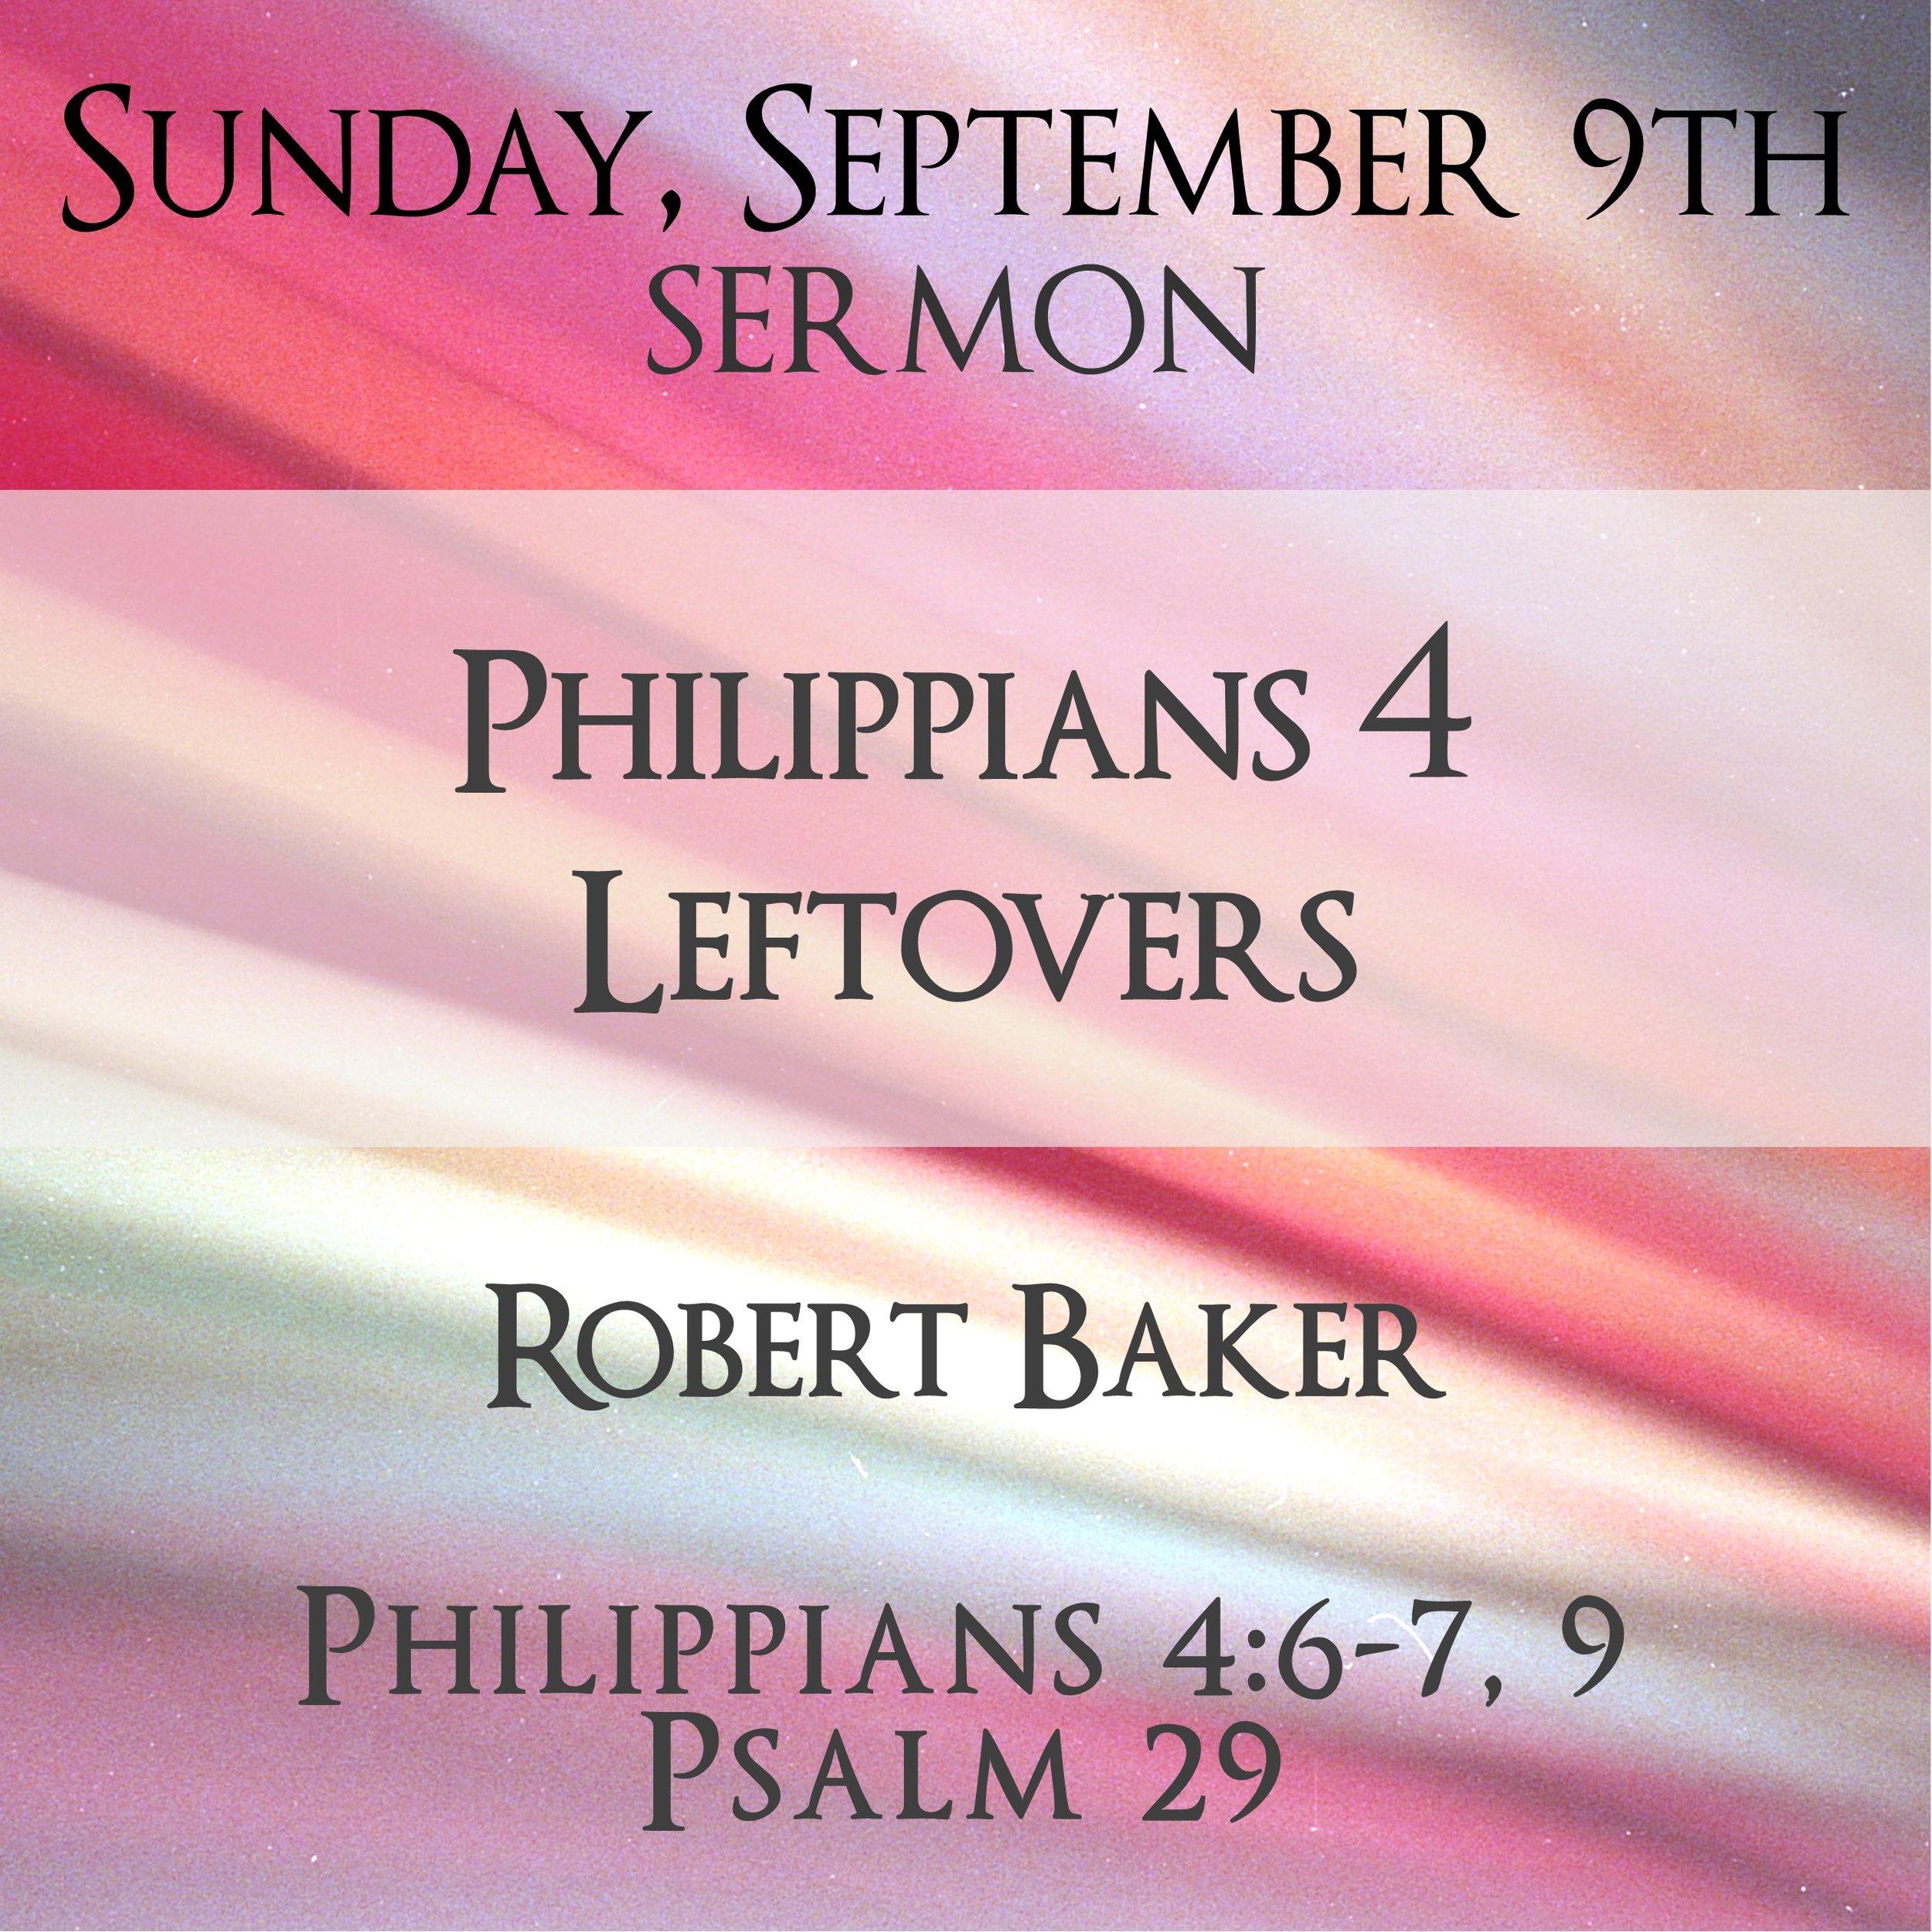 Sept 9 Leftover Calm sermon insta 090918.jpg